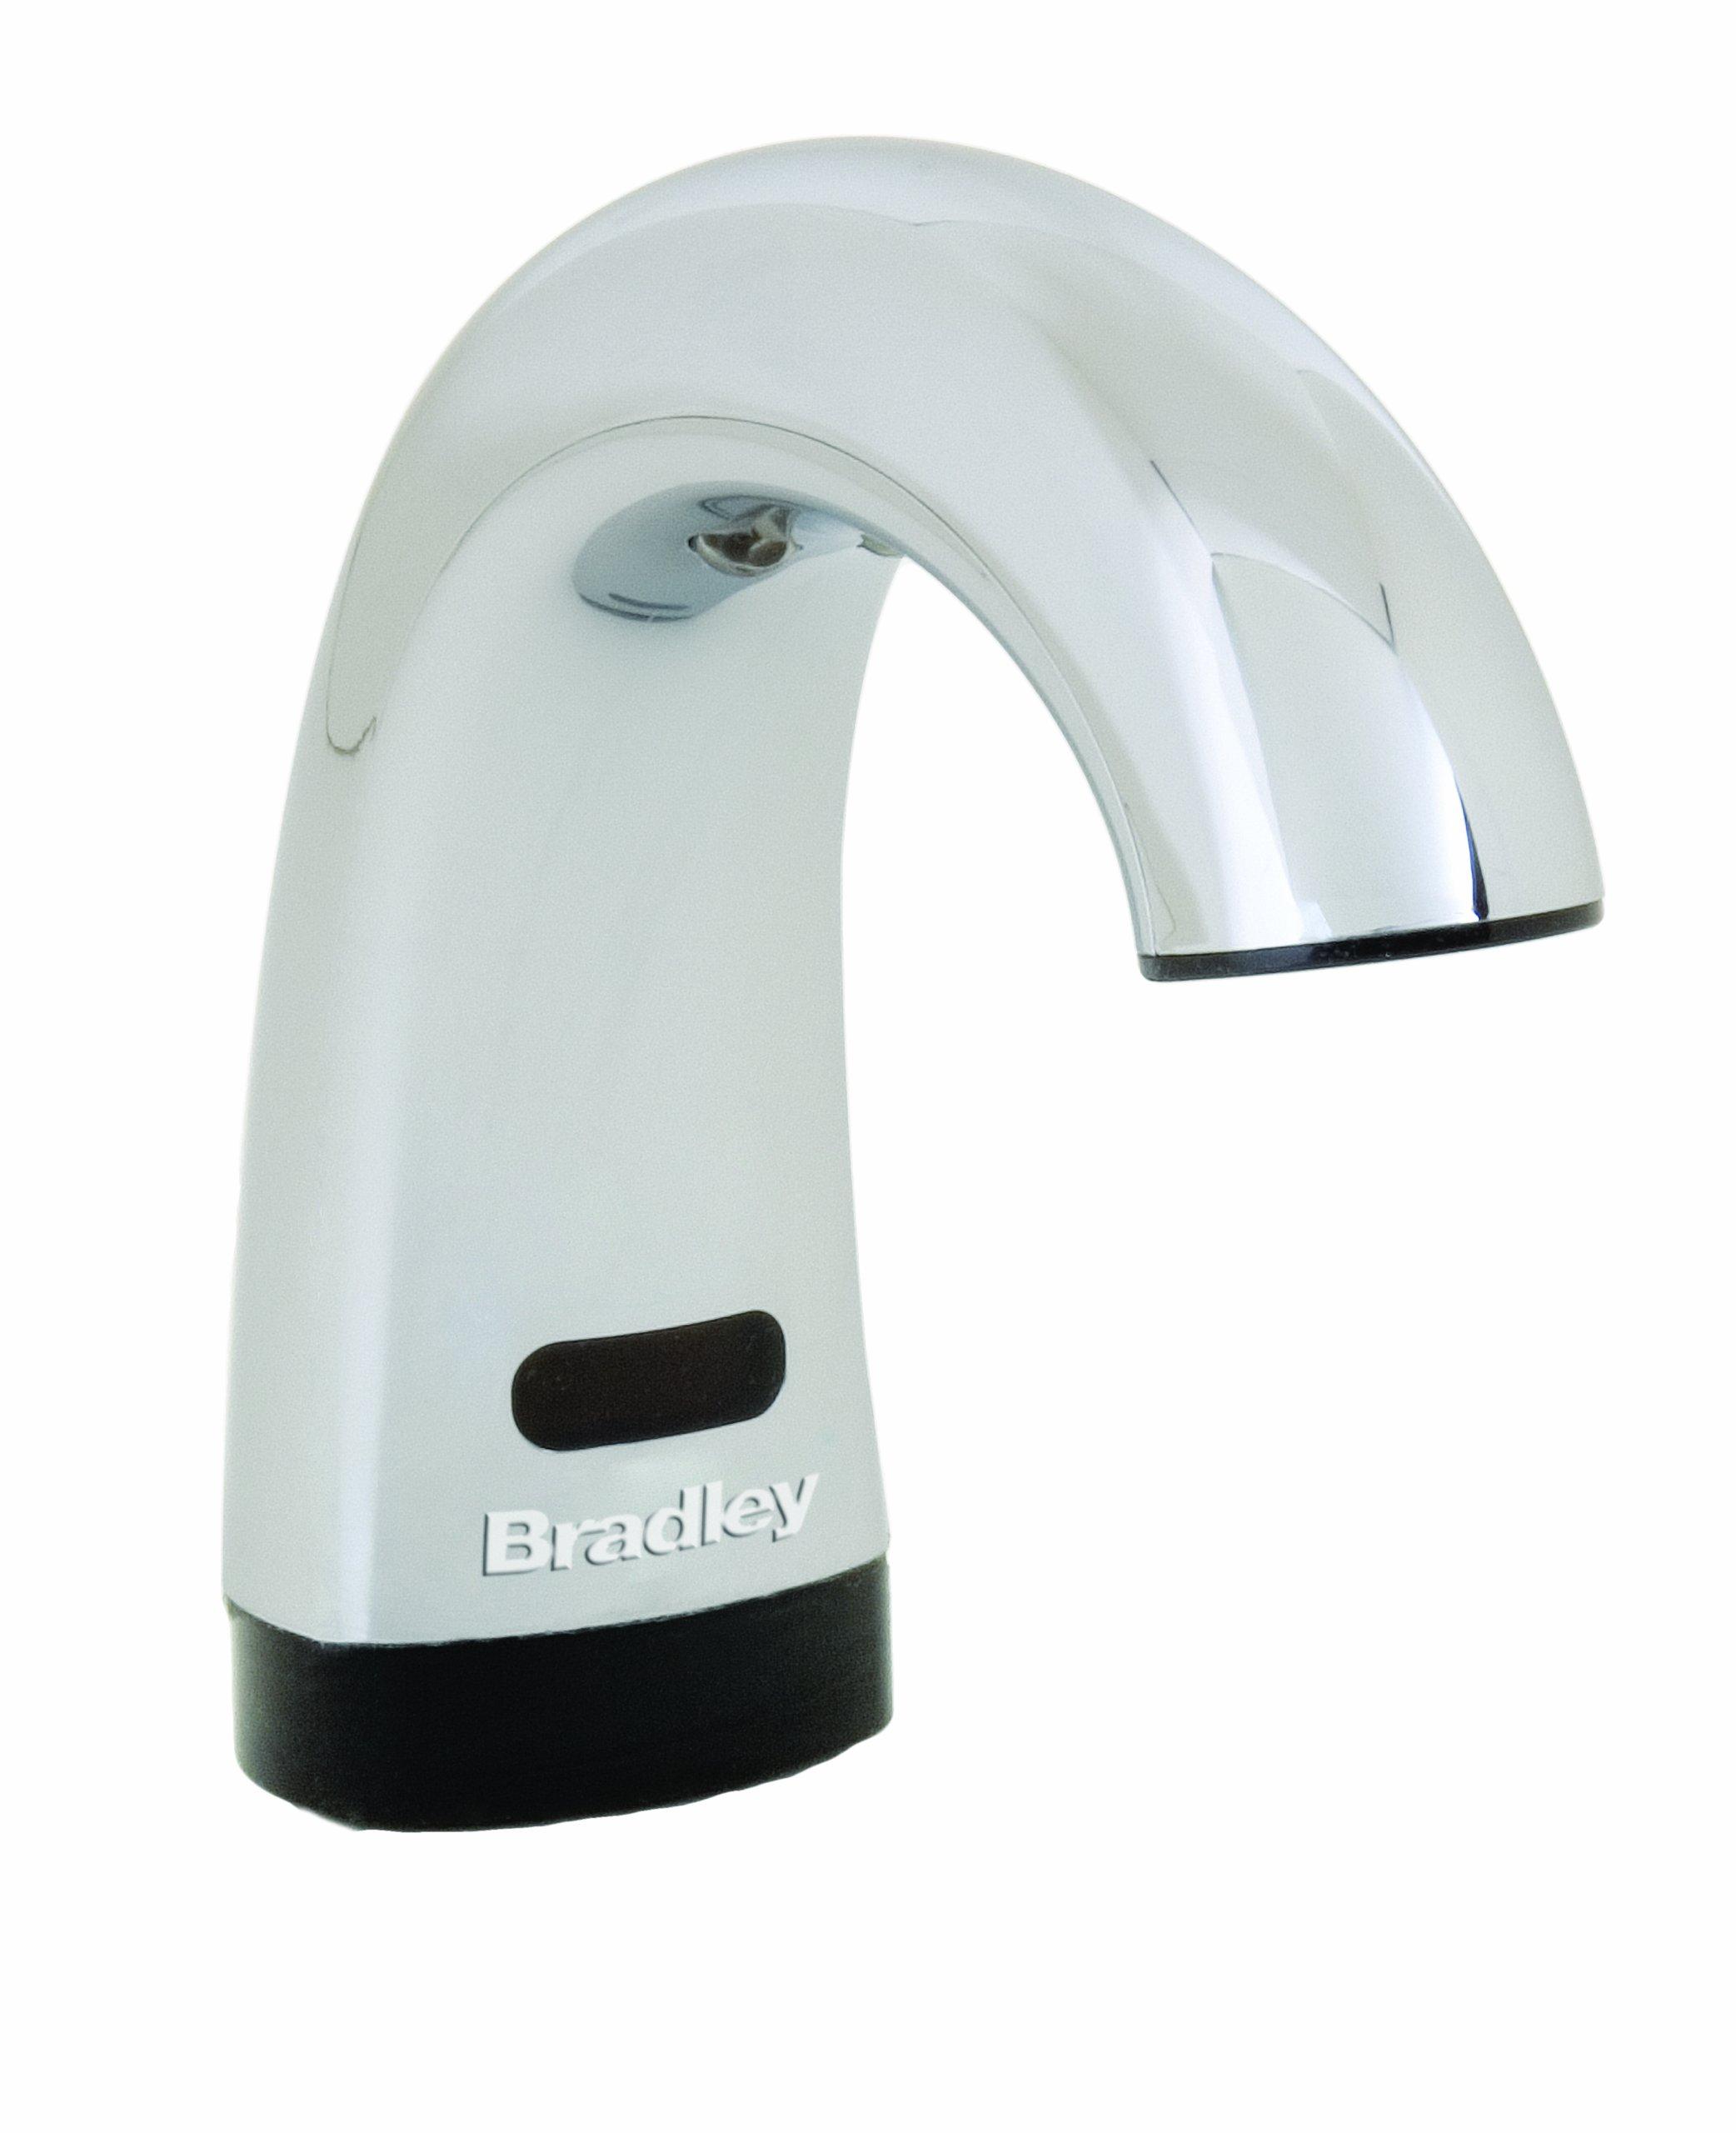 Dispenser Automatico de Jabon BRADLEY [0JVTIJUO]